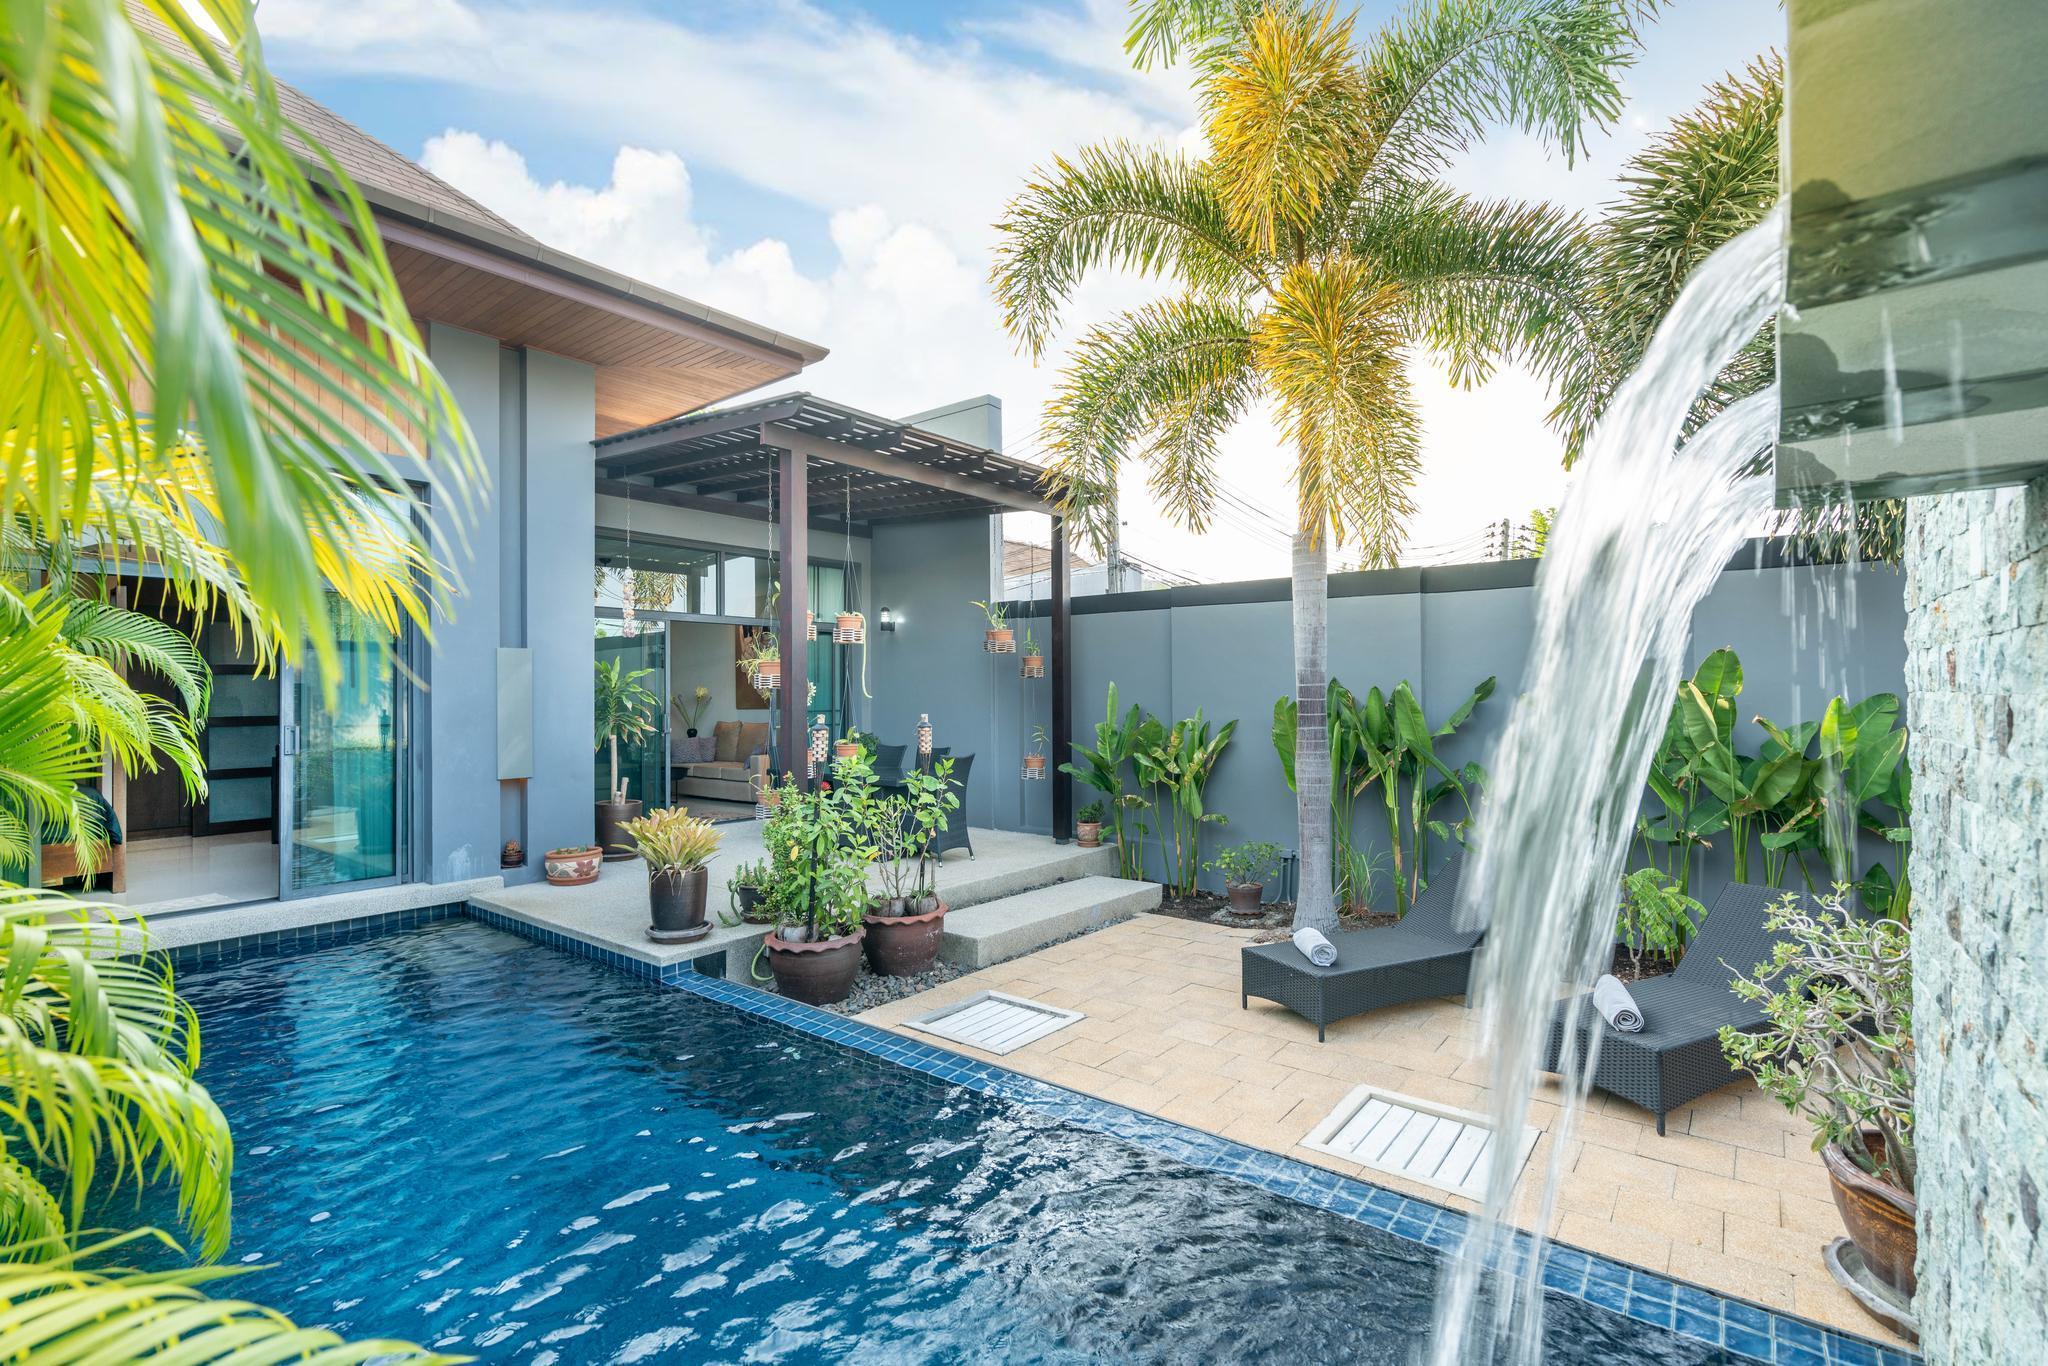 Onyx Lite 2 bedrooms villa with pool Nai Harn วิลลา 2 ห้องนอน 2 ห้องน้ำส่วนตัว ขนาด 200 ตร.ม. – หาดราไวย์